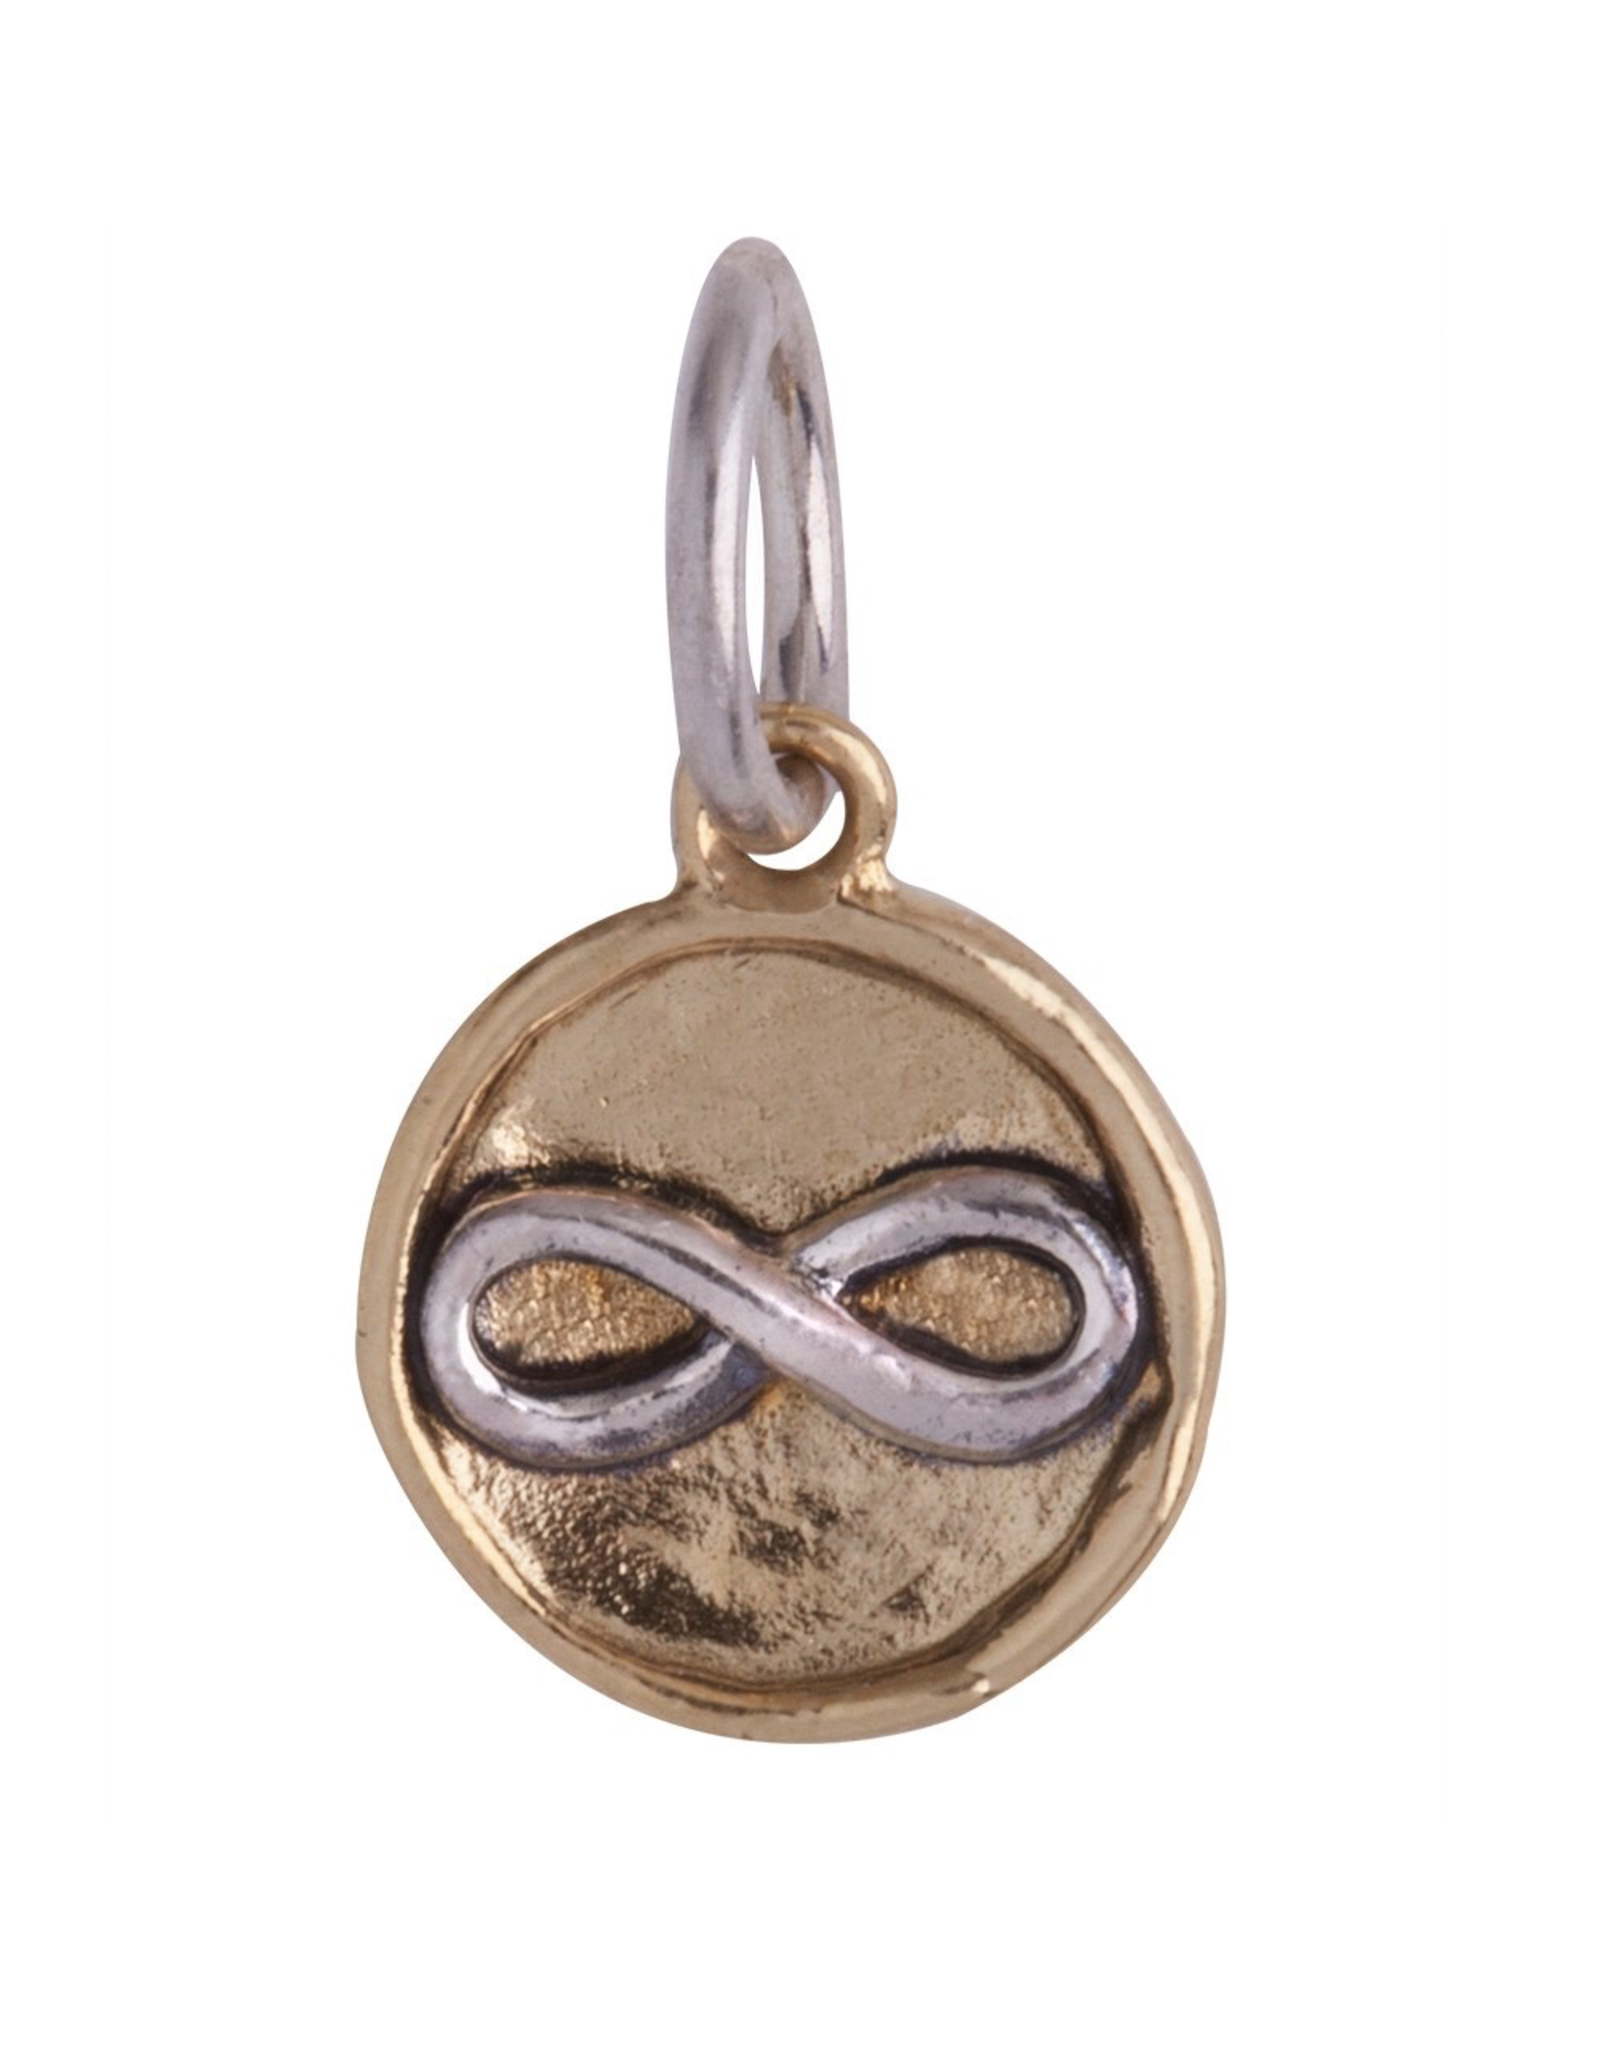 Waxing Poetic® Jewelry Camp Infinity Charm